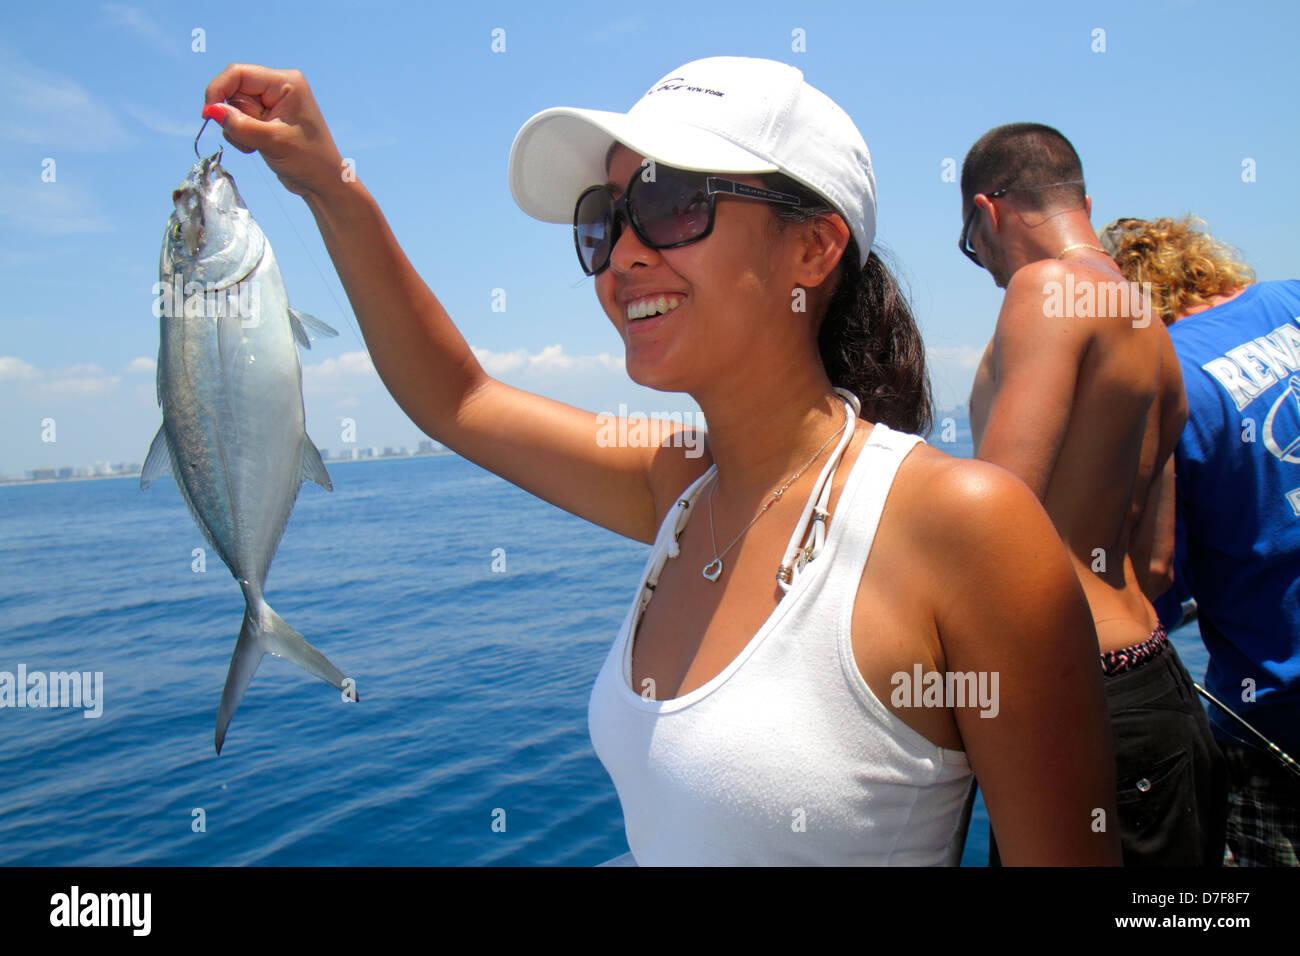 Miami beach florida atlantic ocean water charter fishing for Miami beach fishing charters